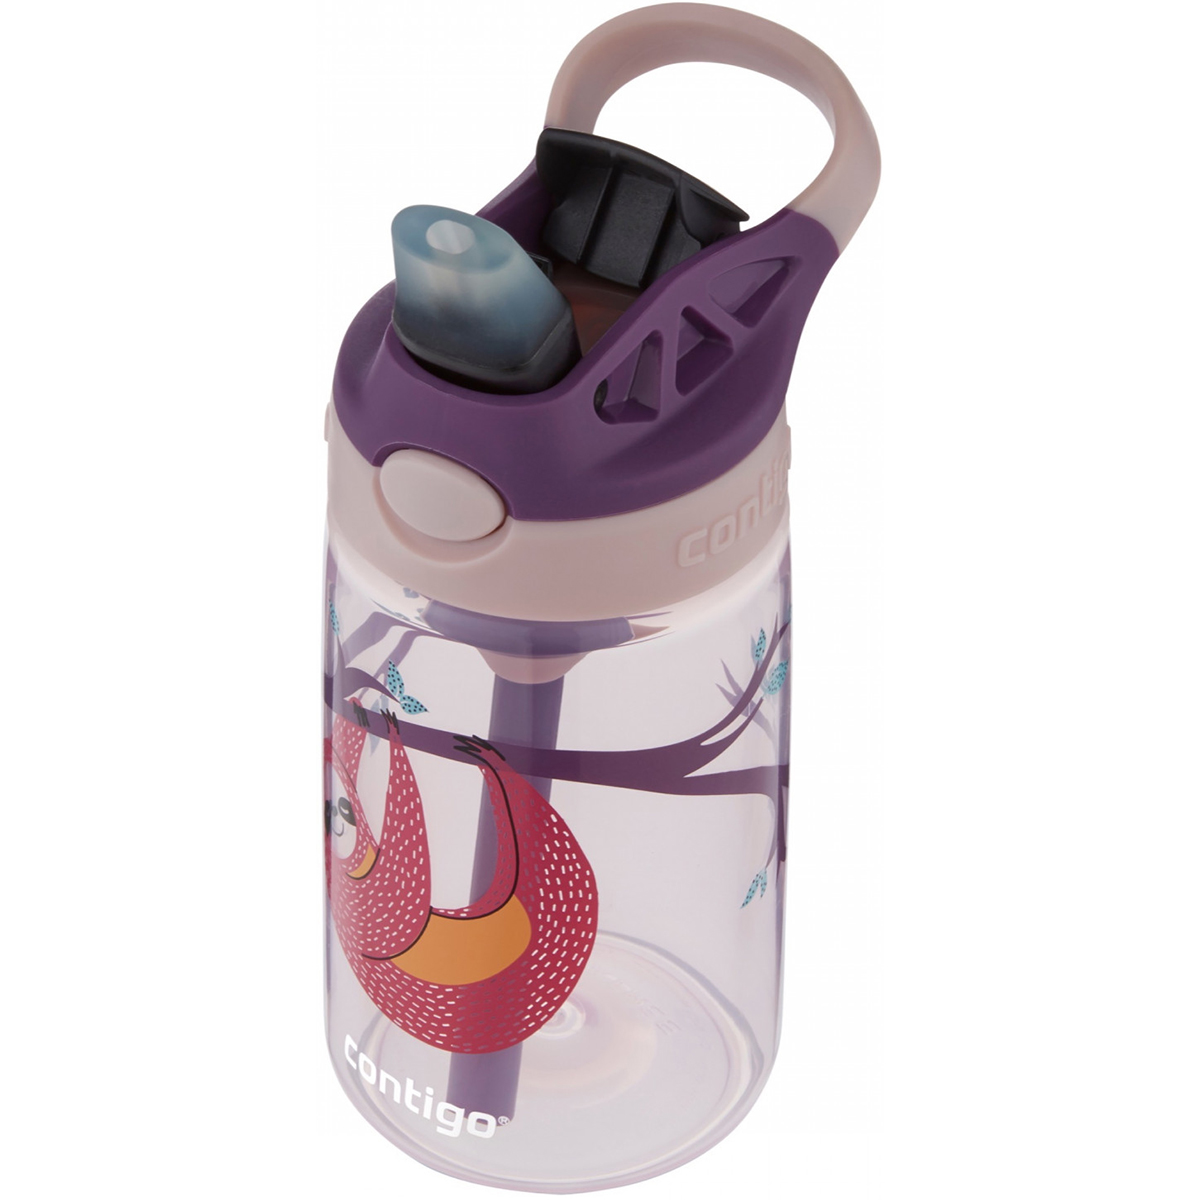 Contigo-Kid-039-s-14-oz-AutoSpout-Straw-Water-Bottle-with-Easy-Clean-Lid thumbnail 37